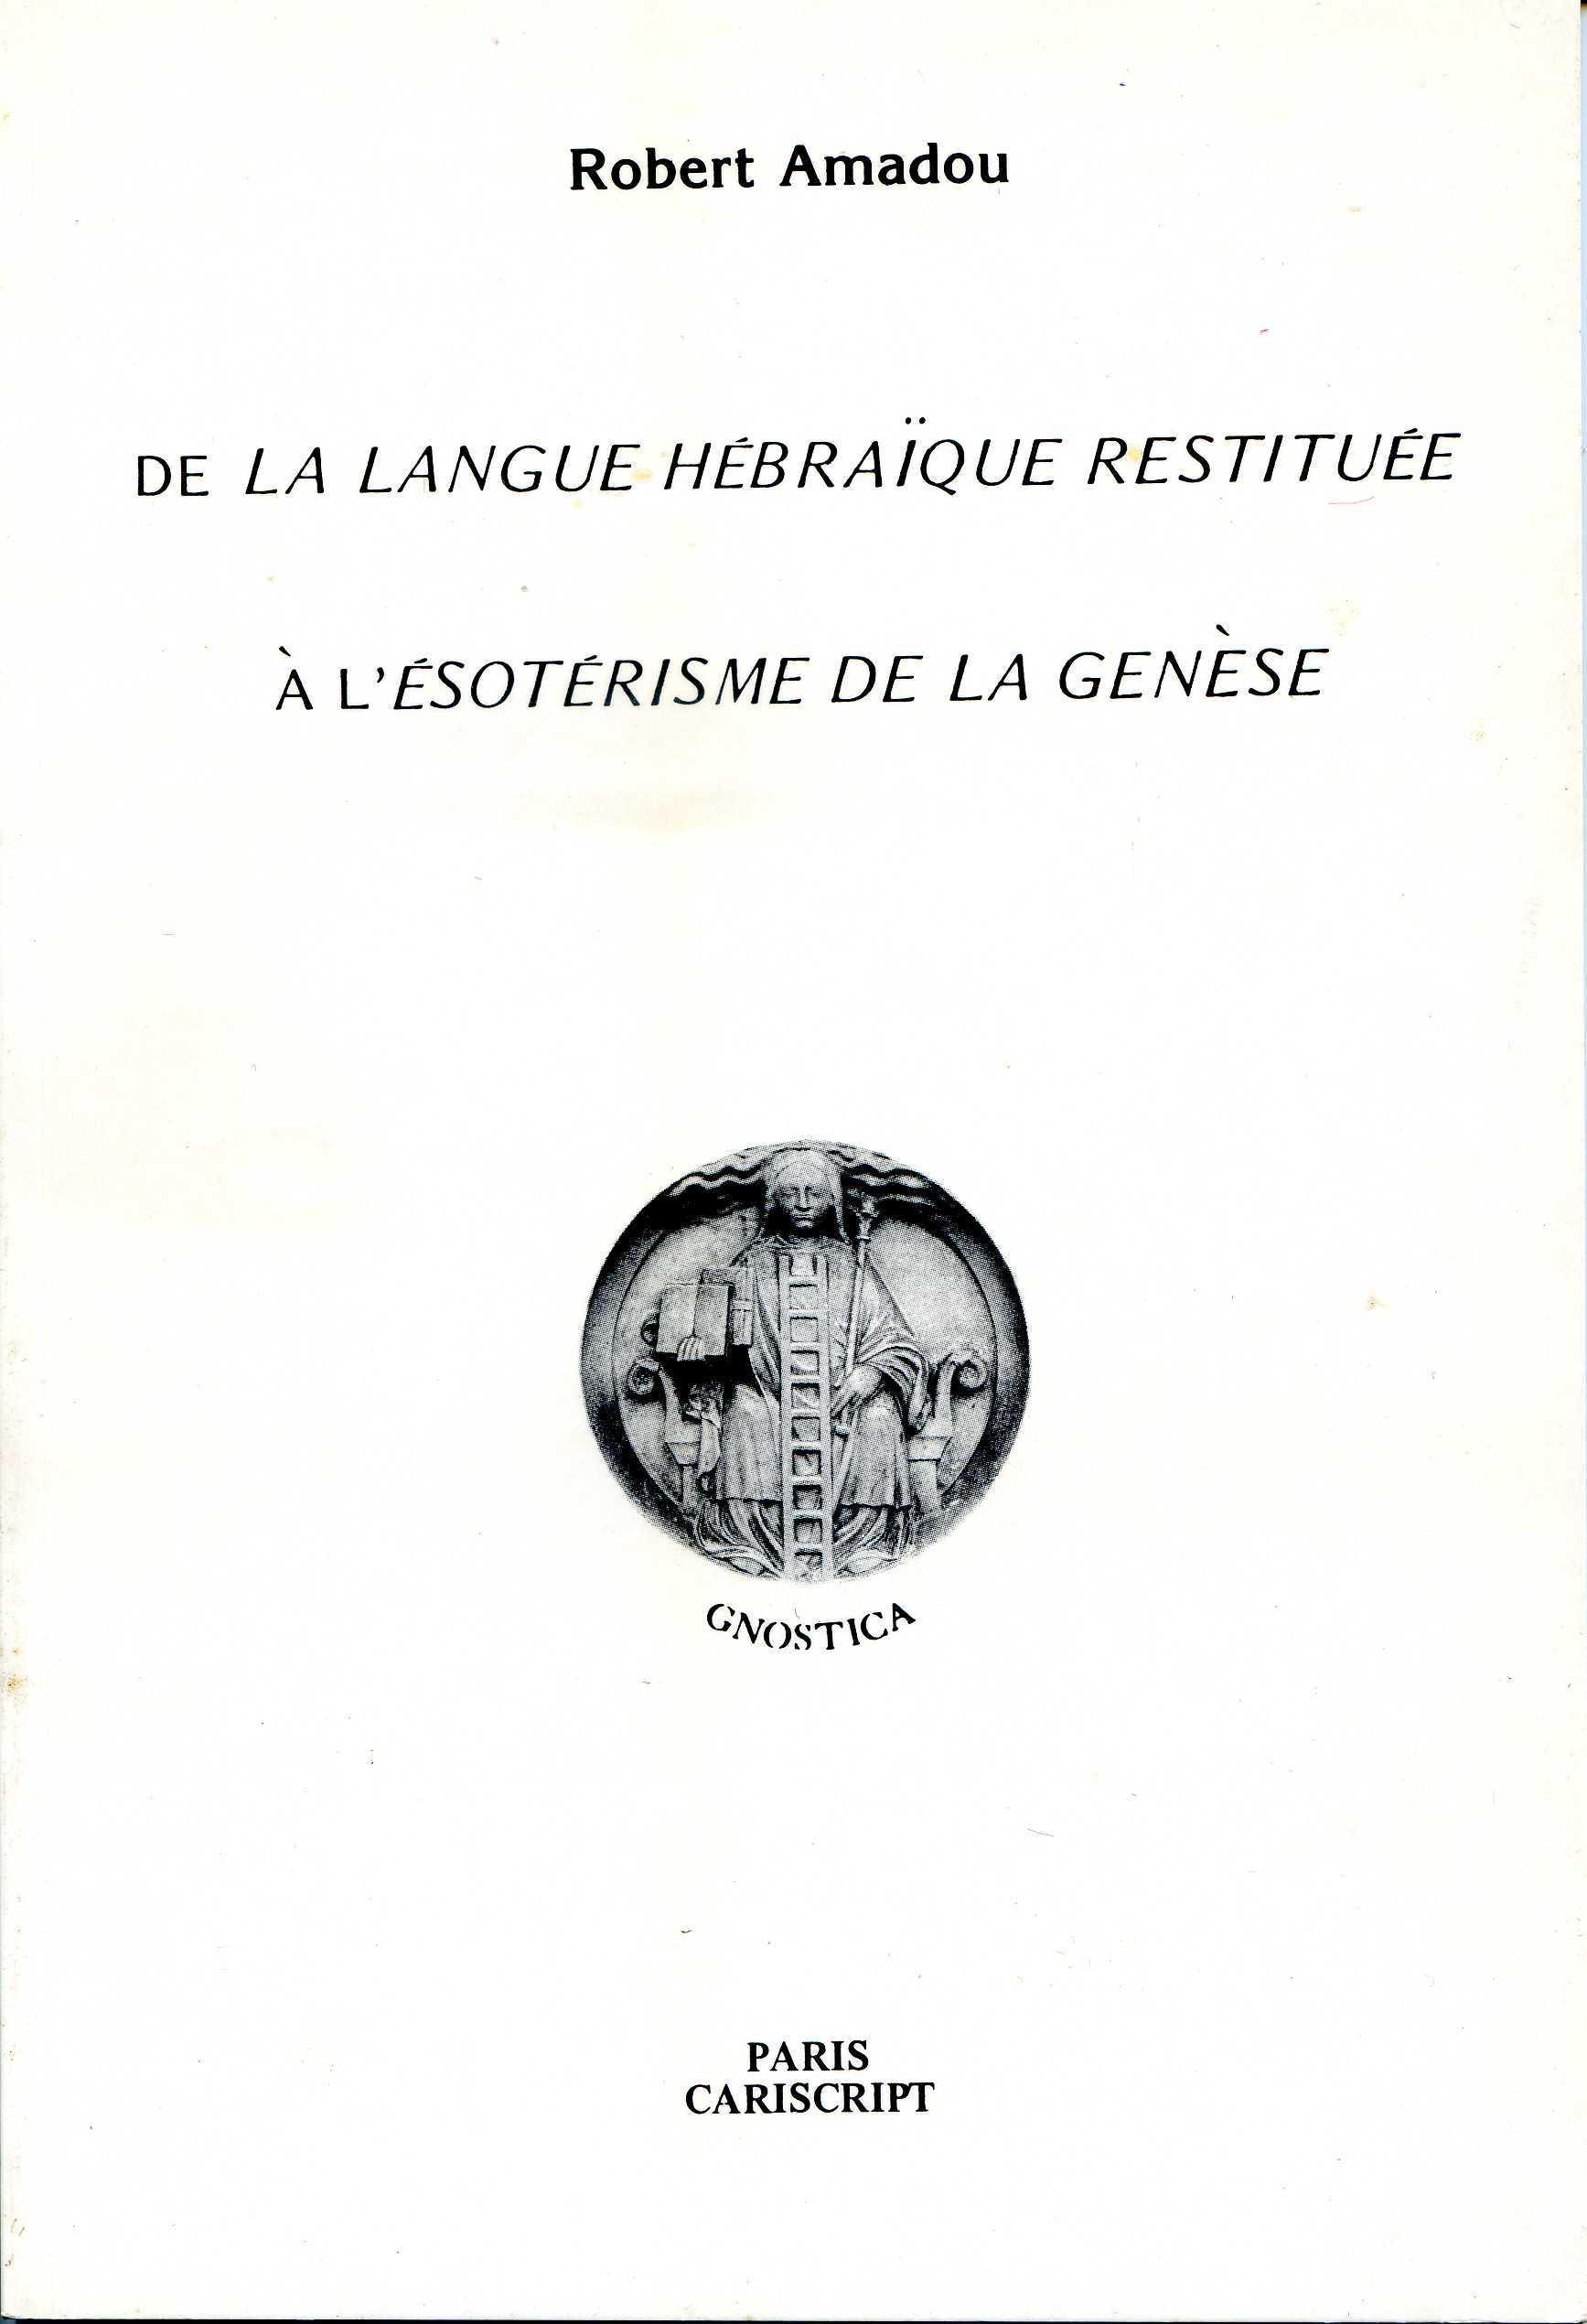 DE LA LANGUE HEBRAIQUE RESTITUEE A L ESOTERISME DE LA GENESE